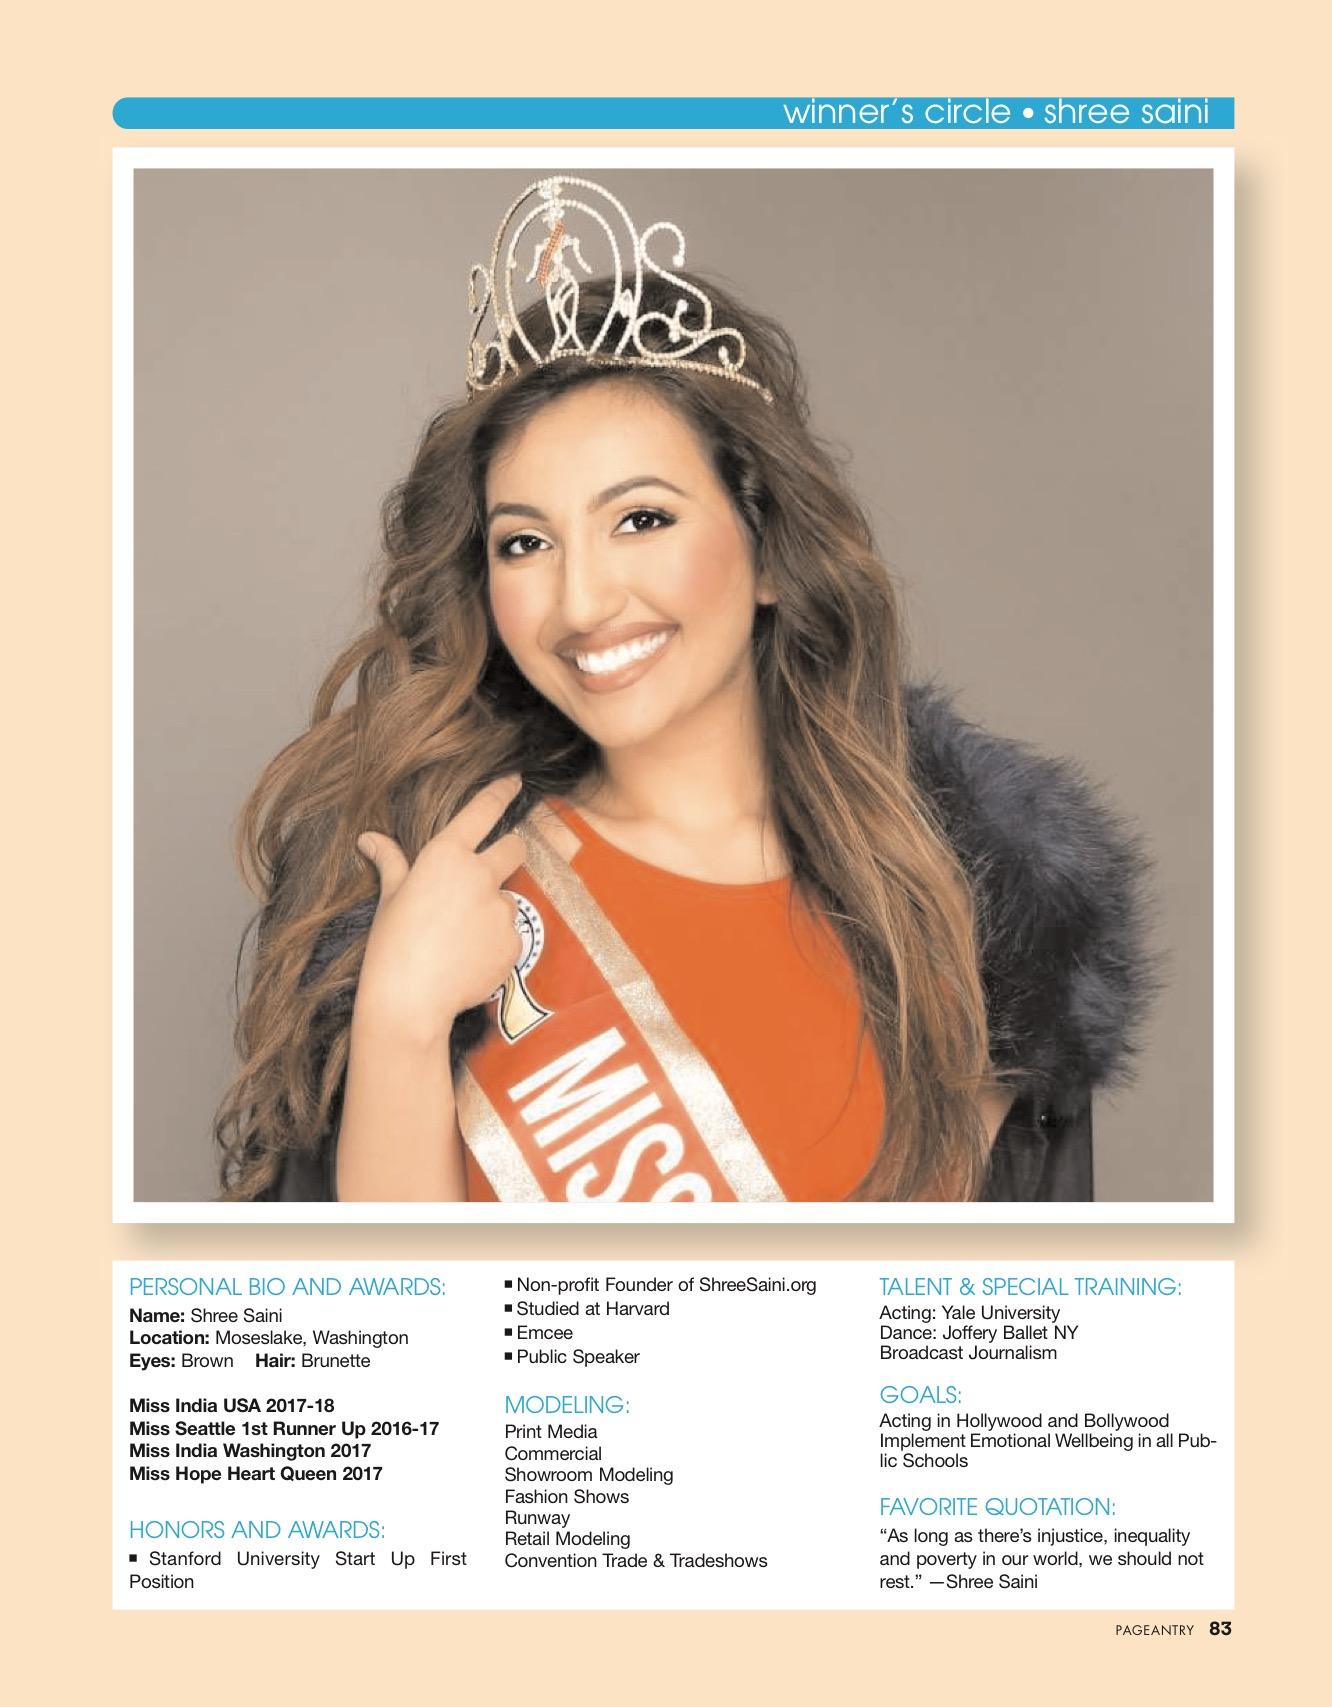 Shree Saini Pageantry magazine Winners Circle